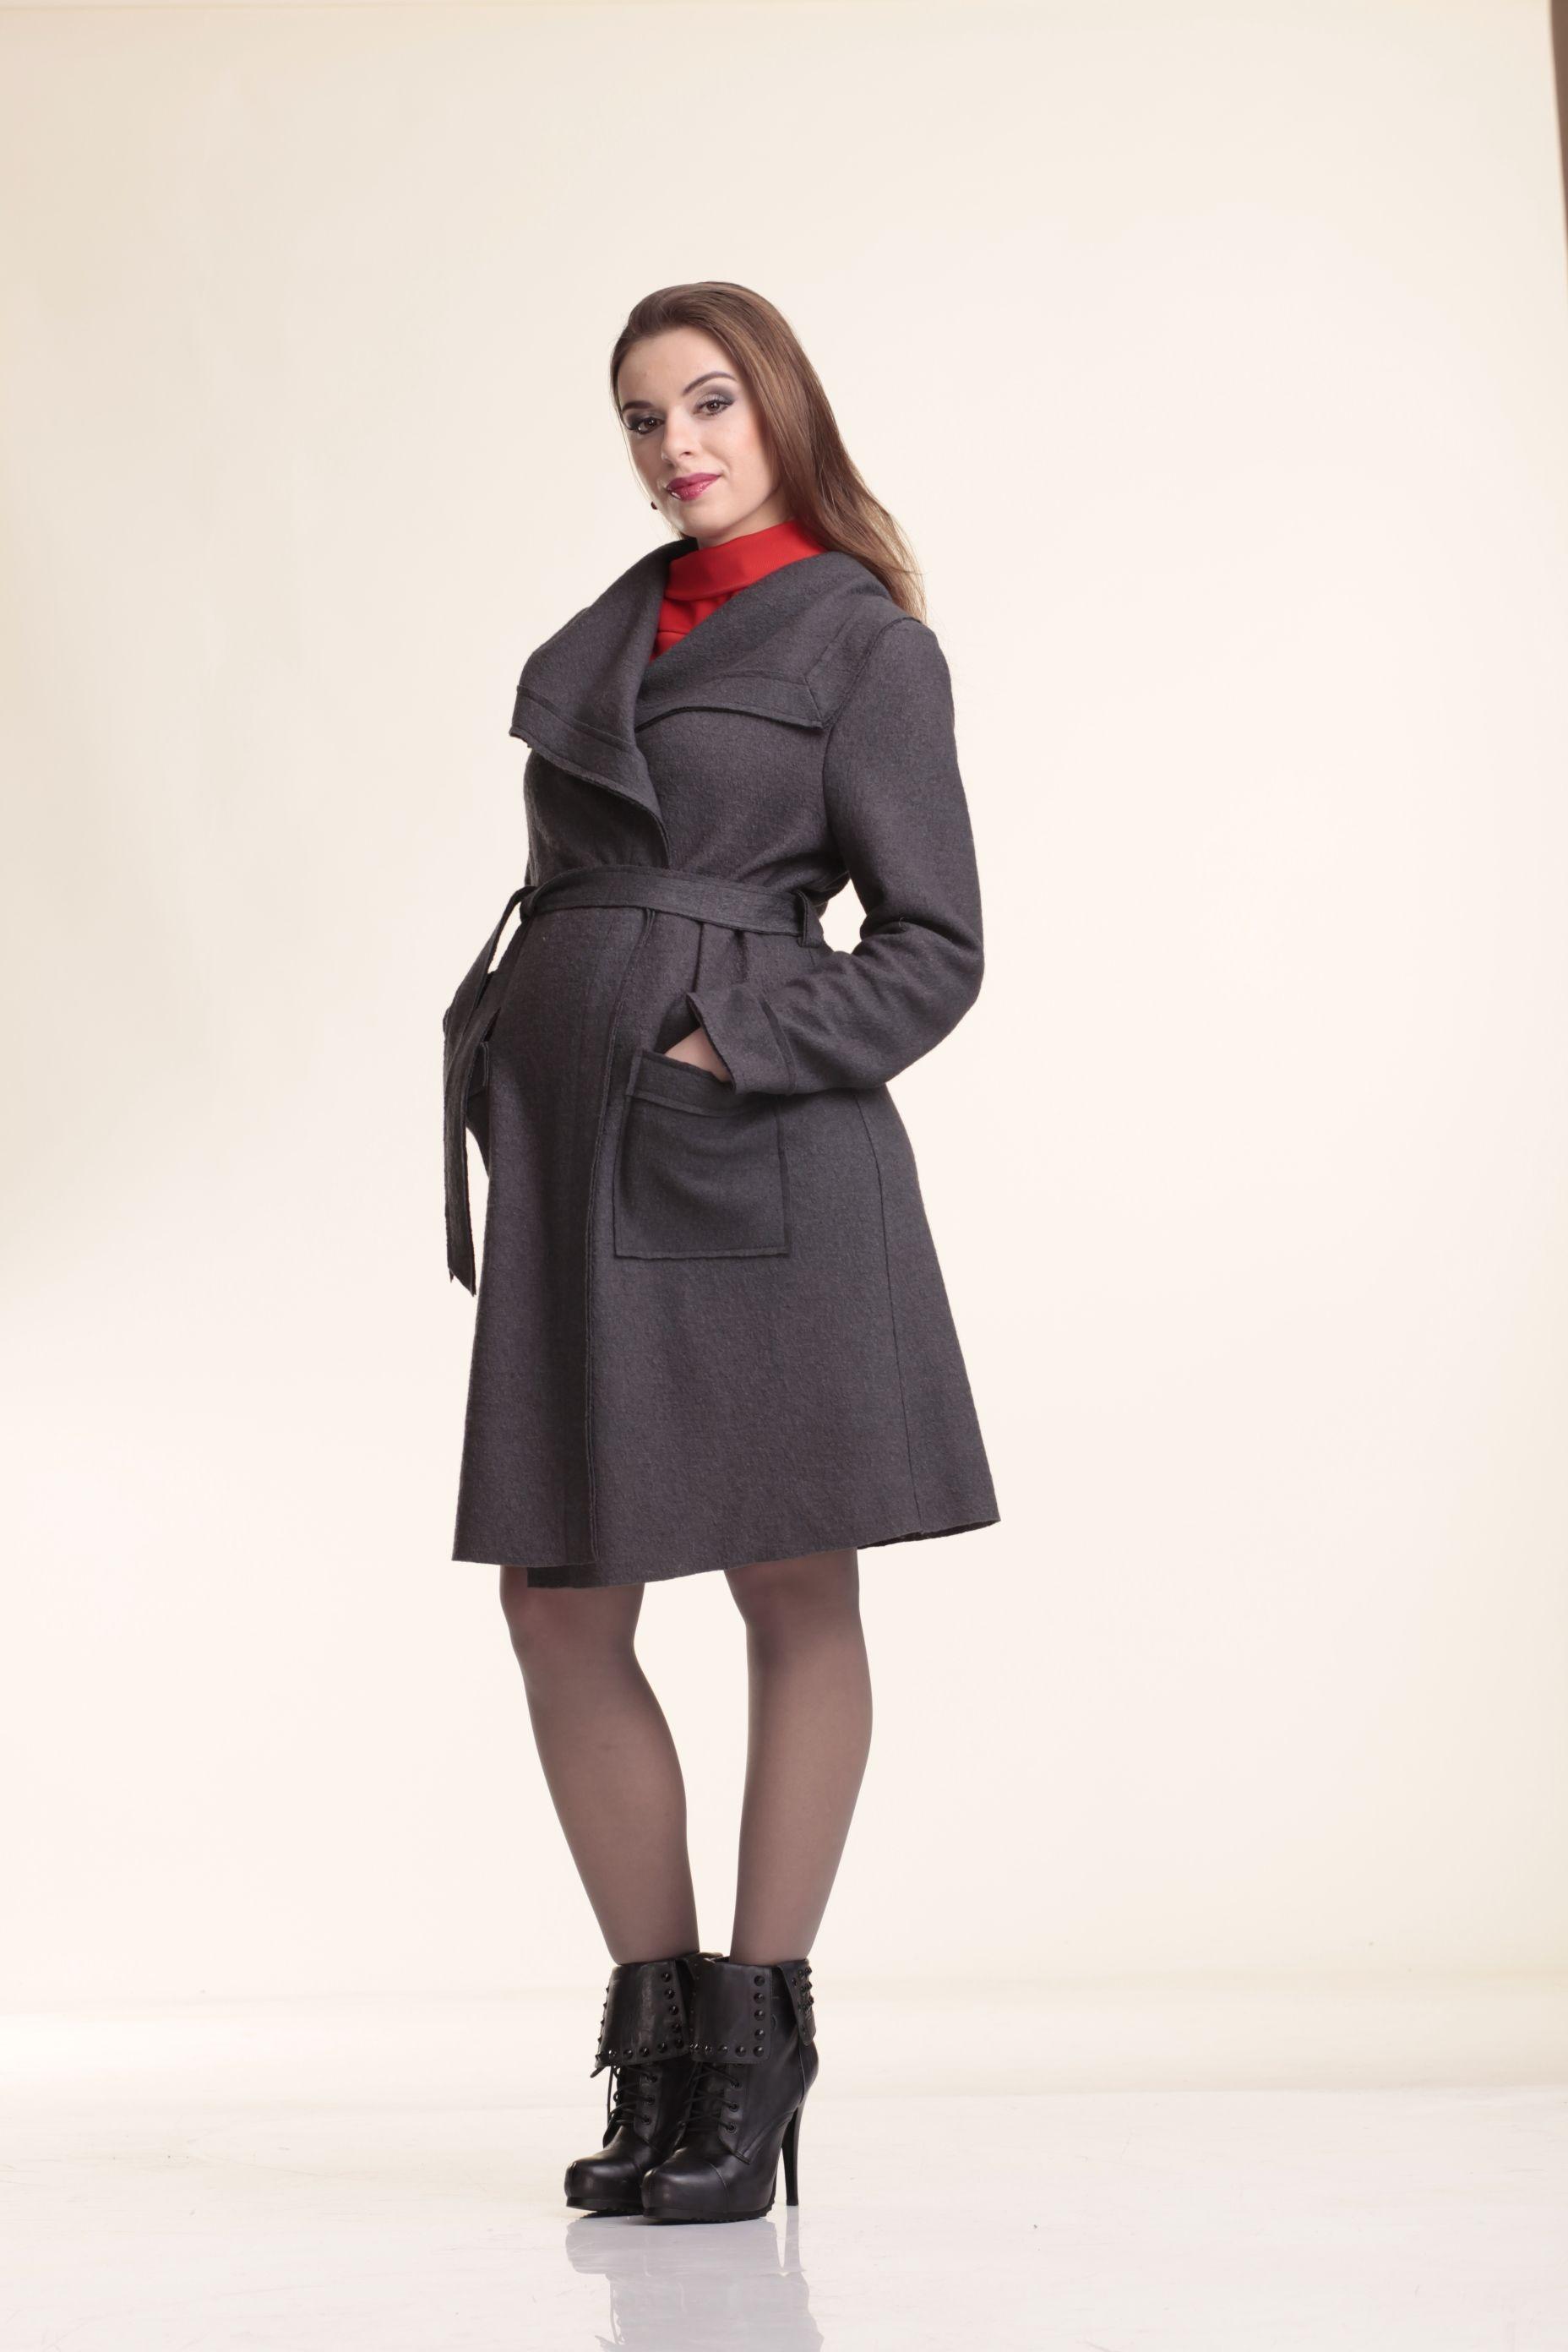 mama ija dorothy wrap wool maternity coat pregnancy fashion #1: de b7ab1d325fe4f0151eadba